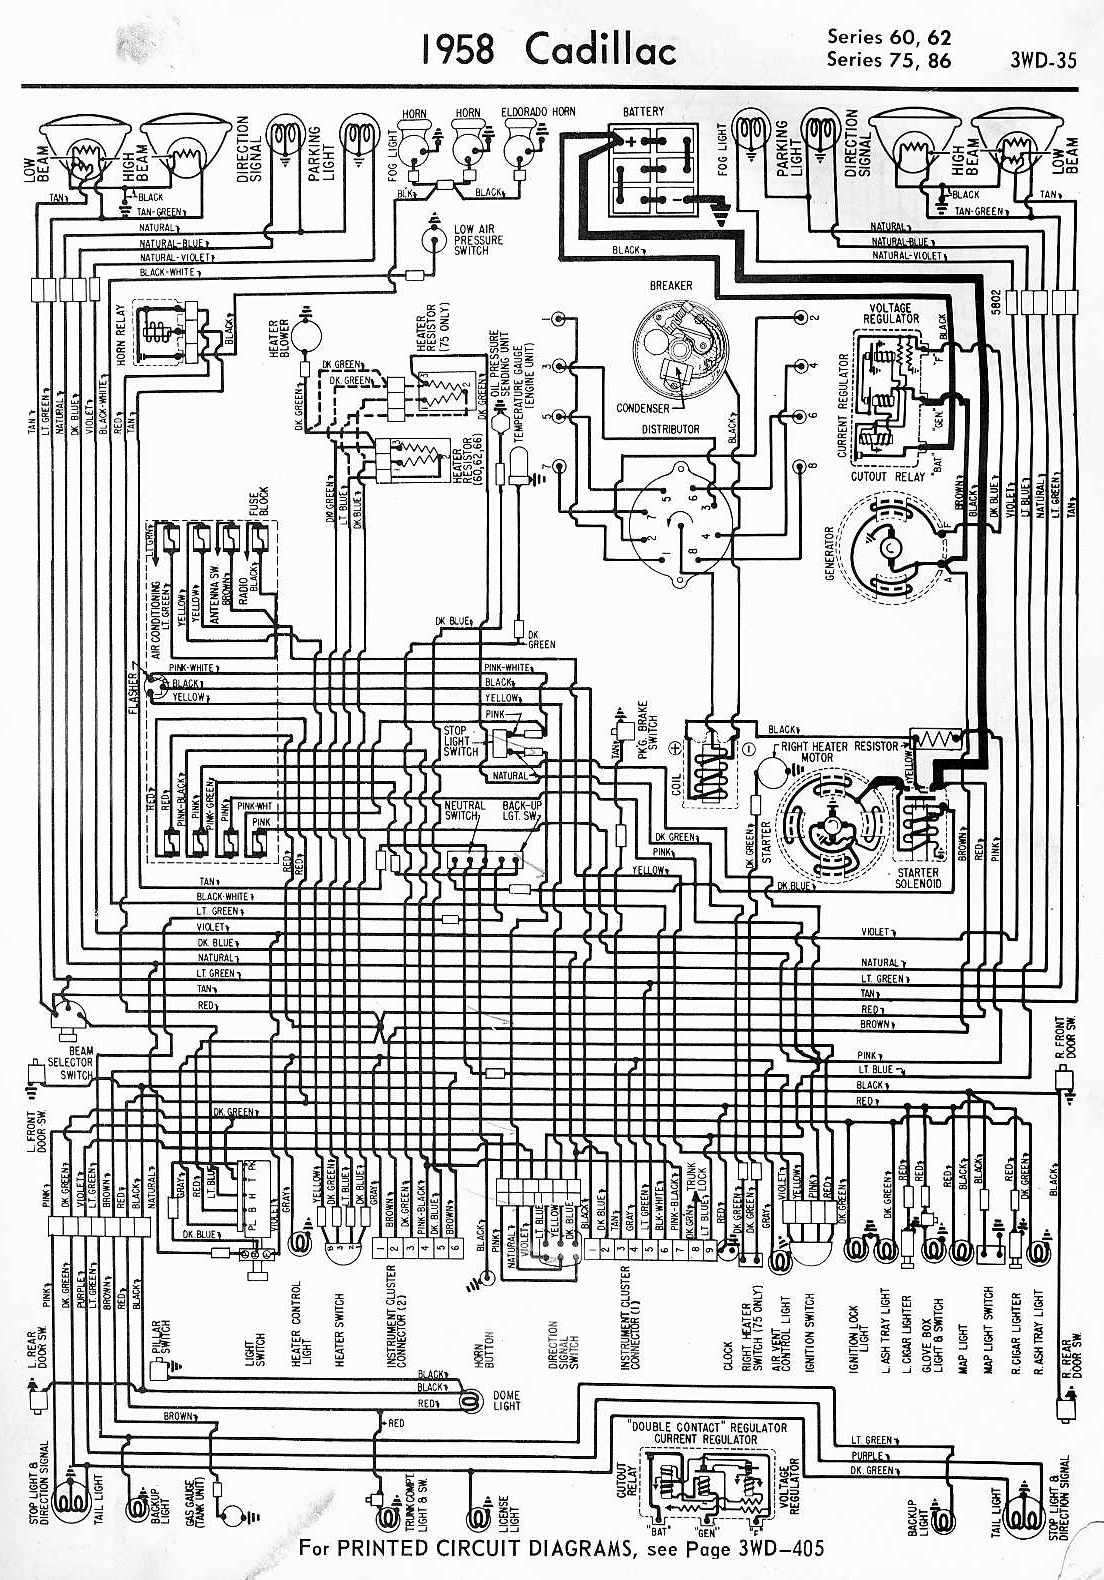 1994 Cadillac Seville Wiring Diagram Library 2000 Sls Deville Speaker